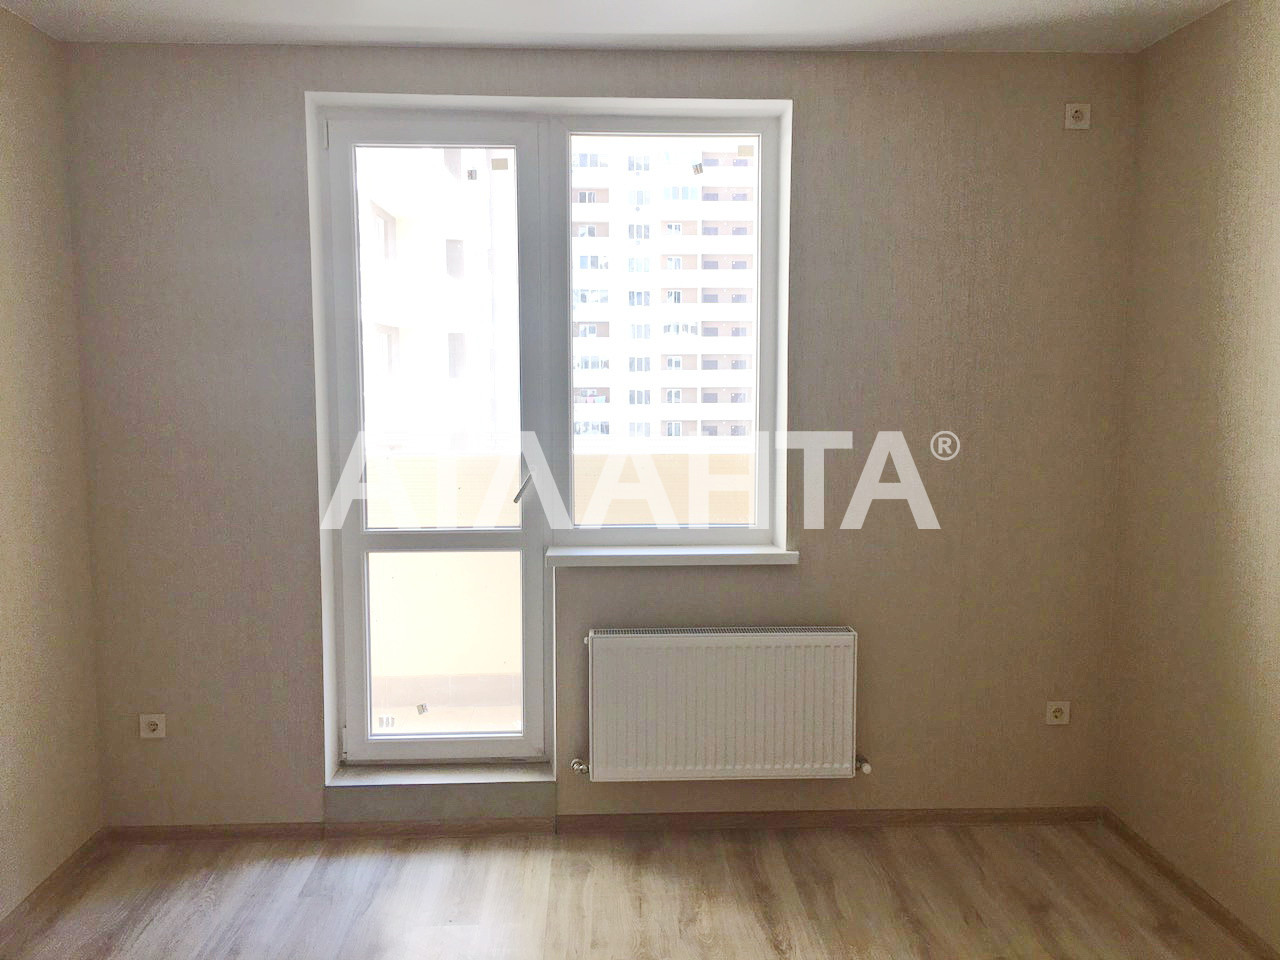 Продается 1-комнатная Квартира на ул. Воробьева Ак. — 34 500 у.е. (фото №8)